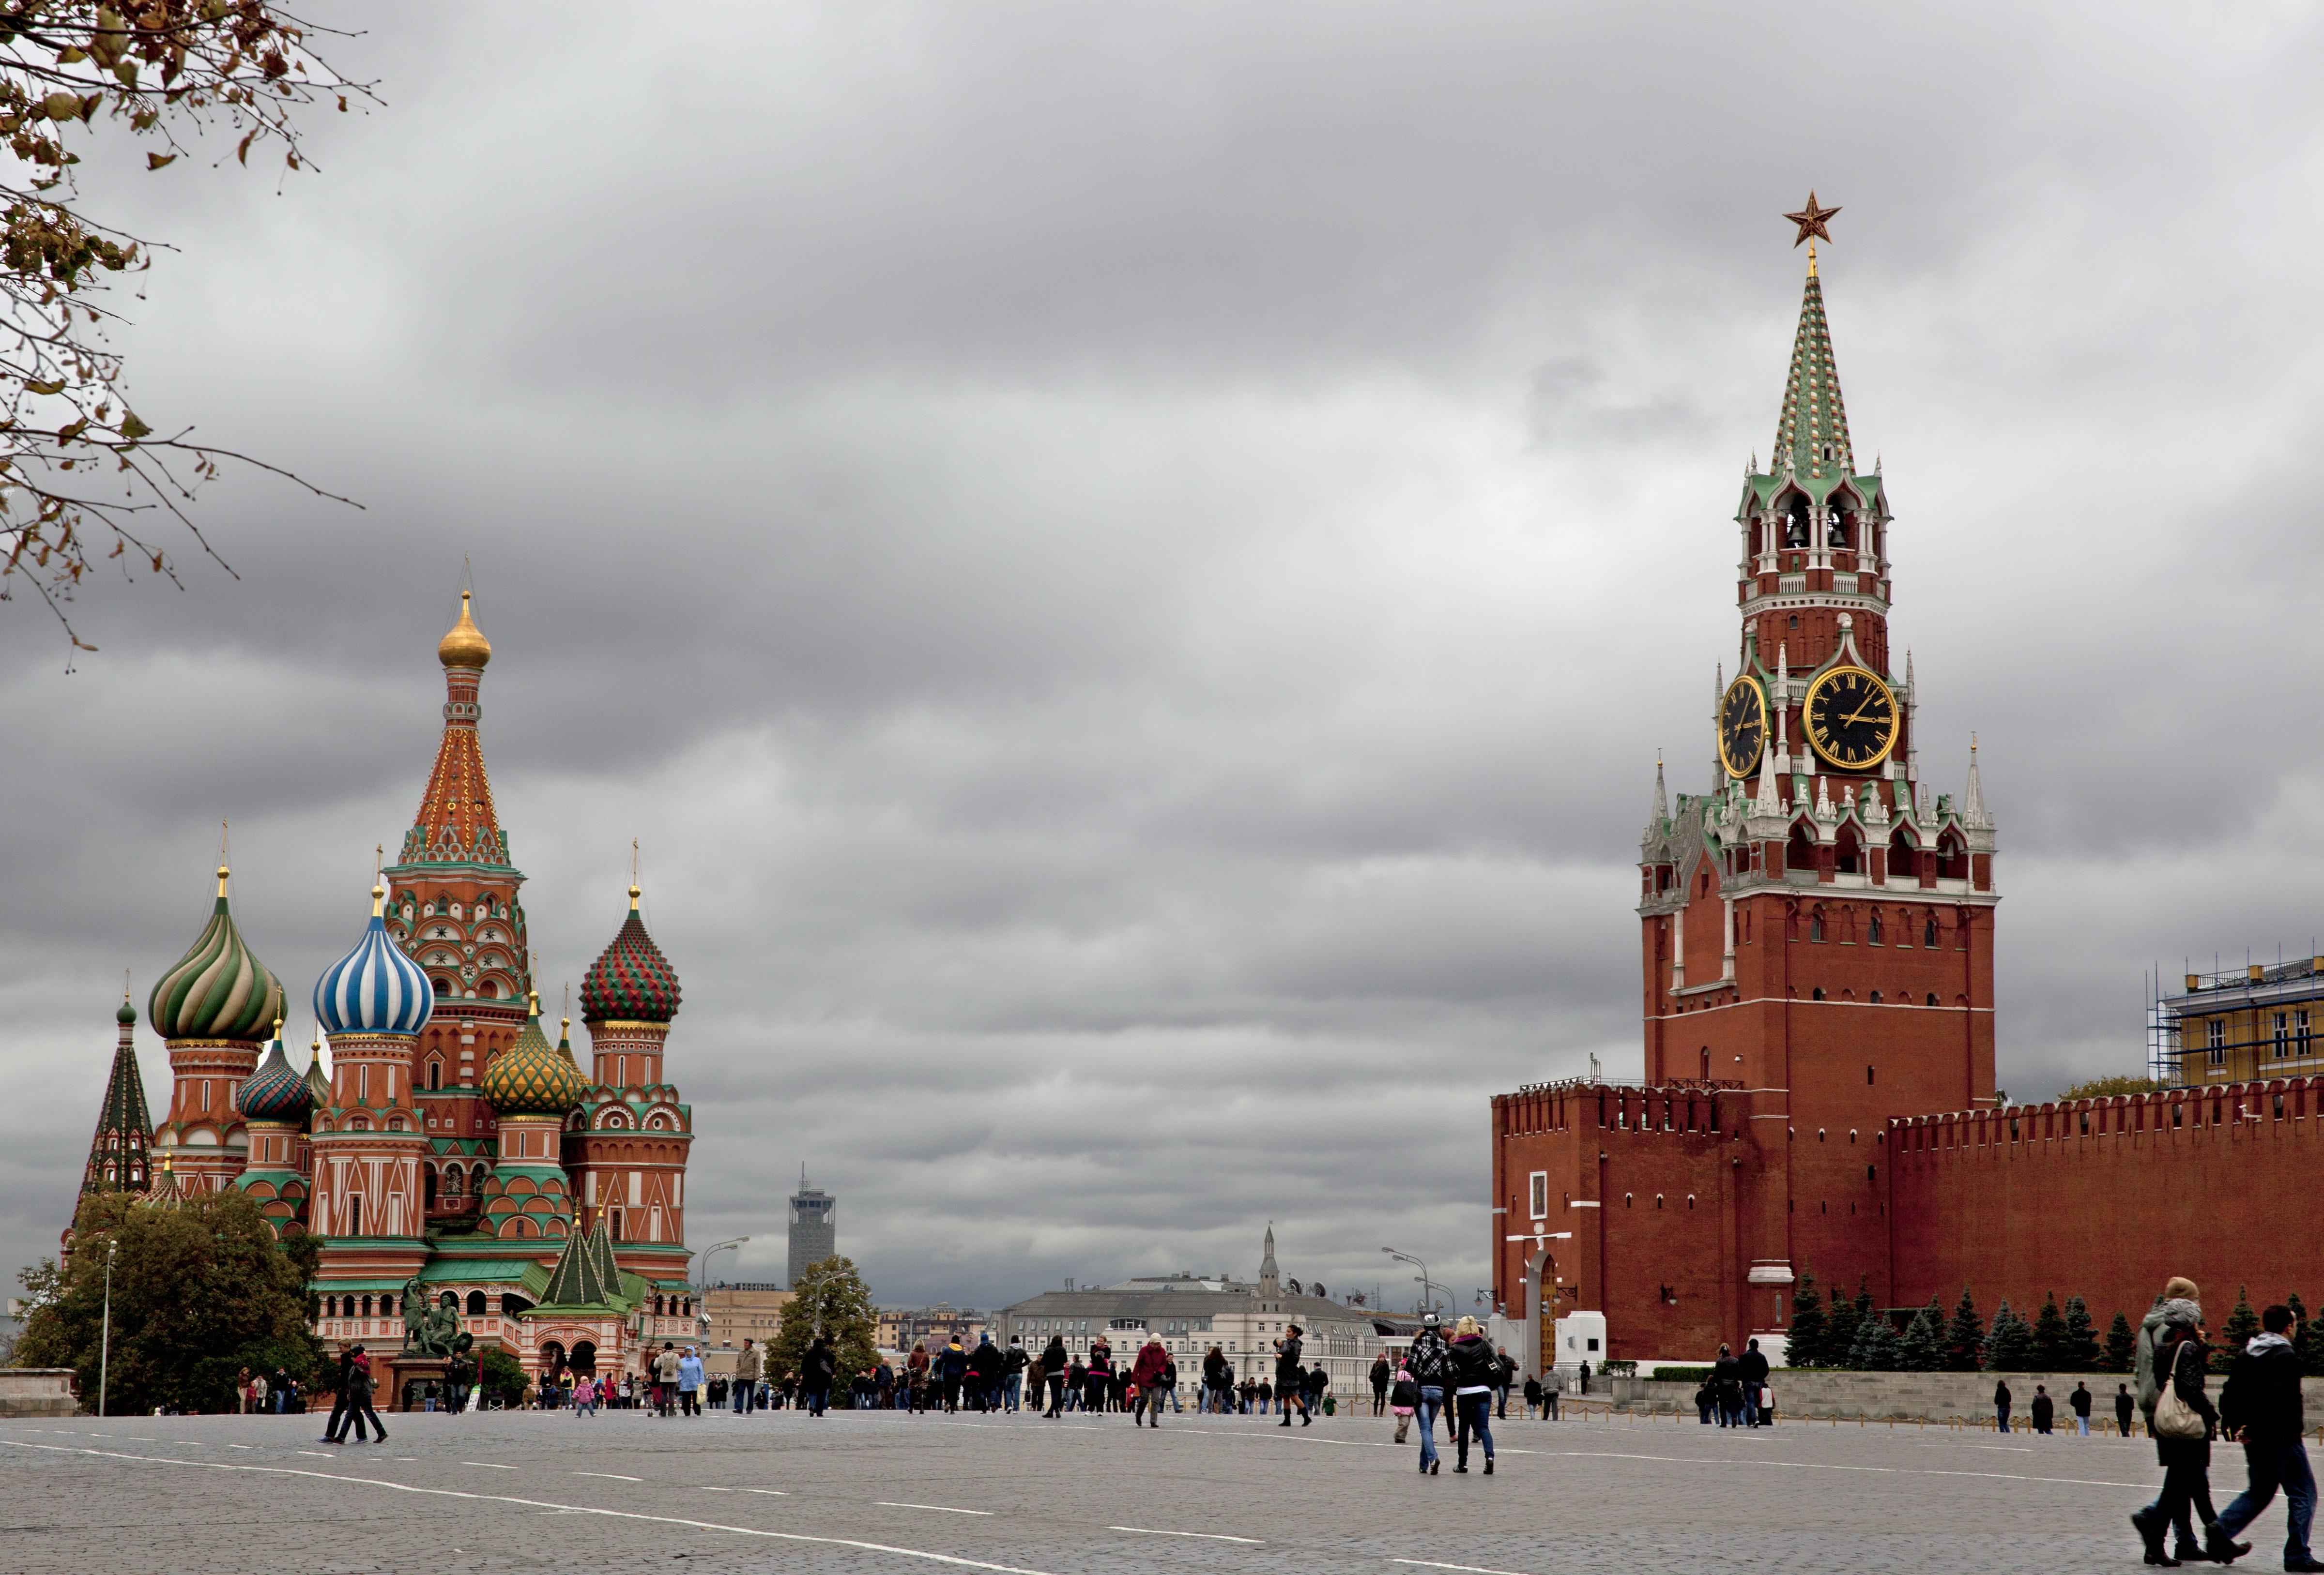 krasnaia_ploshchad_moscow